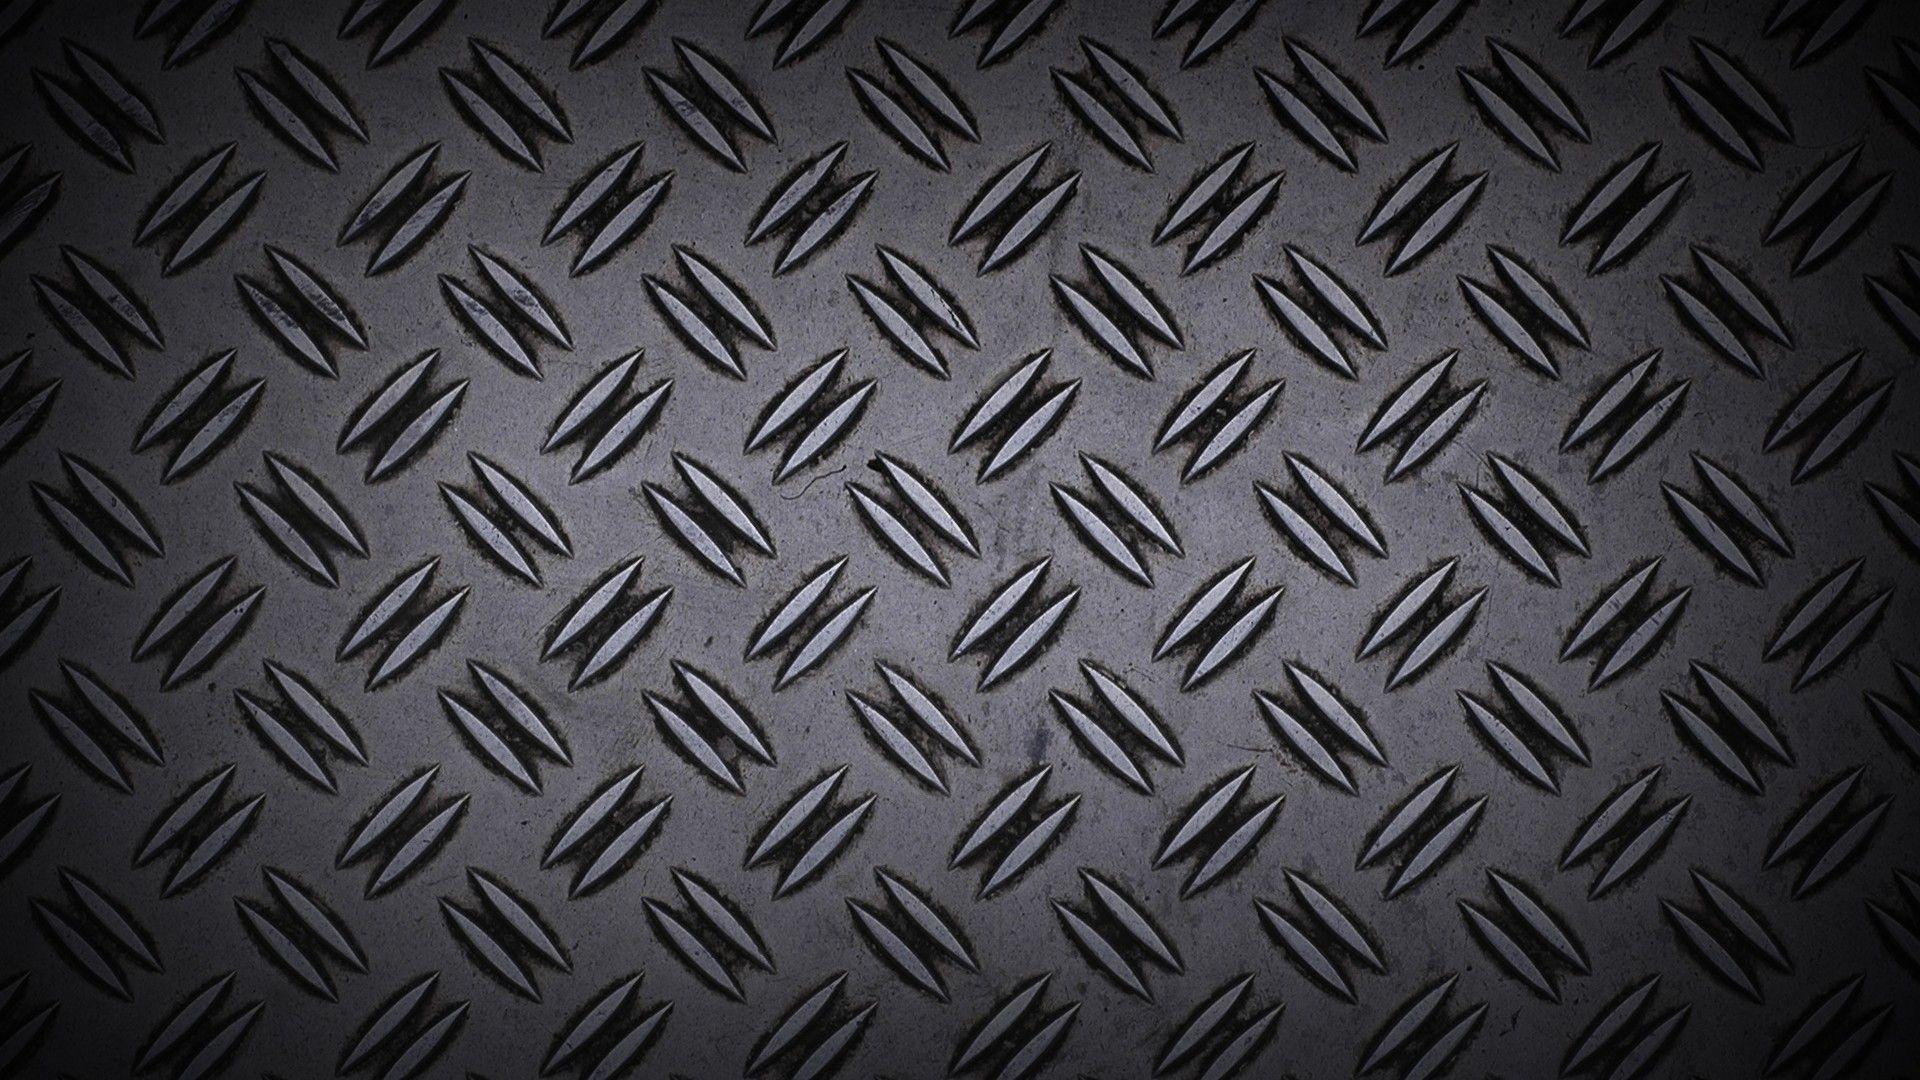 Stainless Steel good wallpaper hd